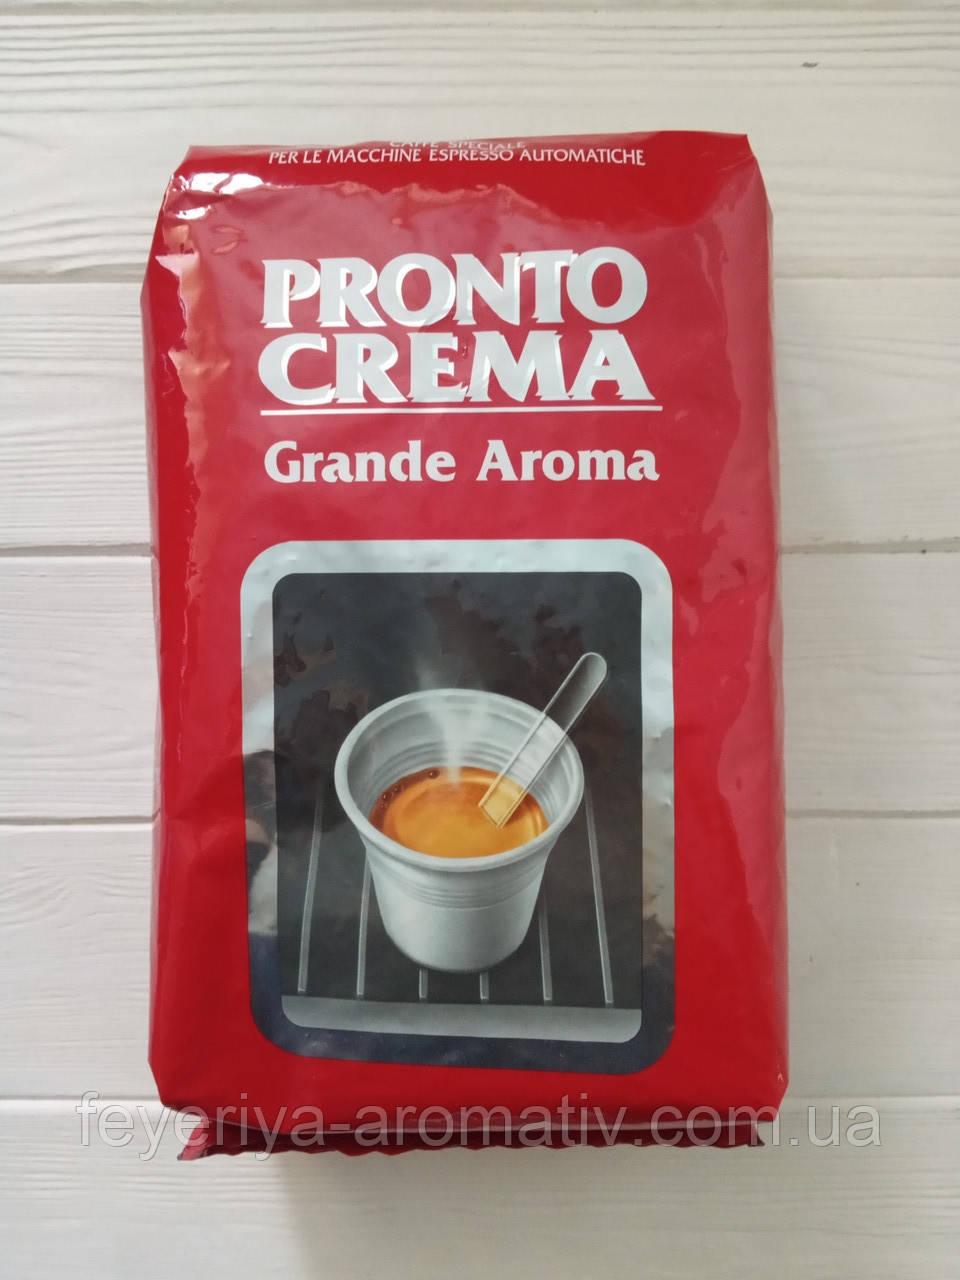 Кофе Pronto Crema Grande Aroma 1 кг (Италия)